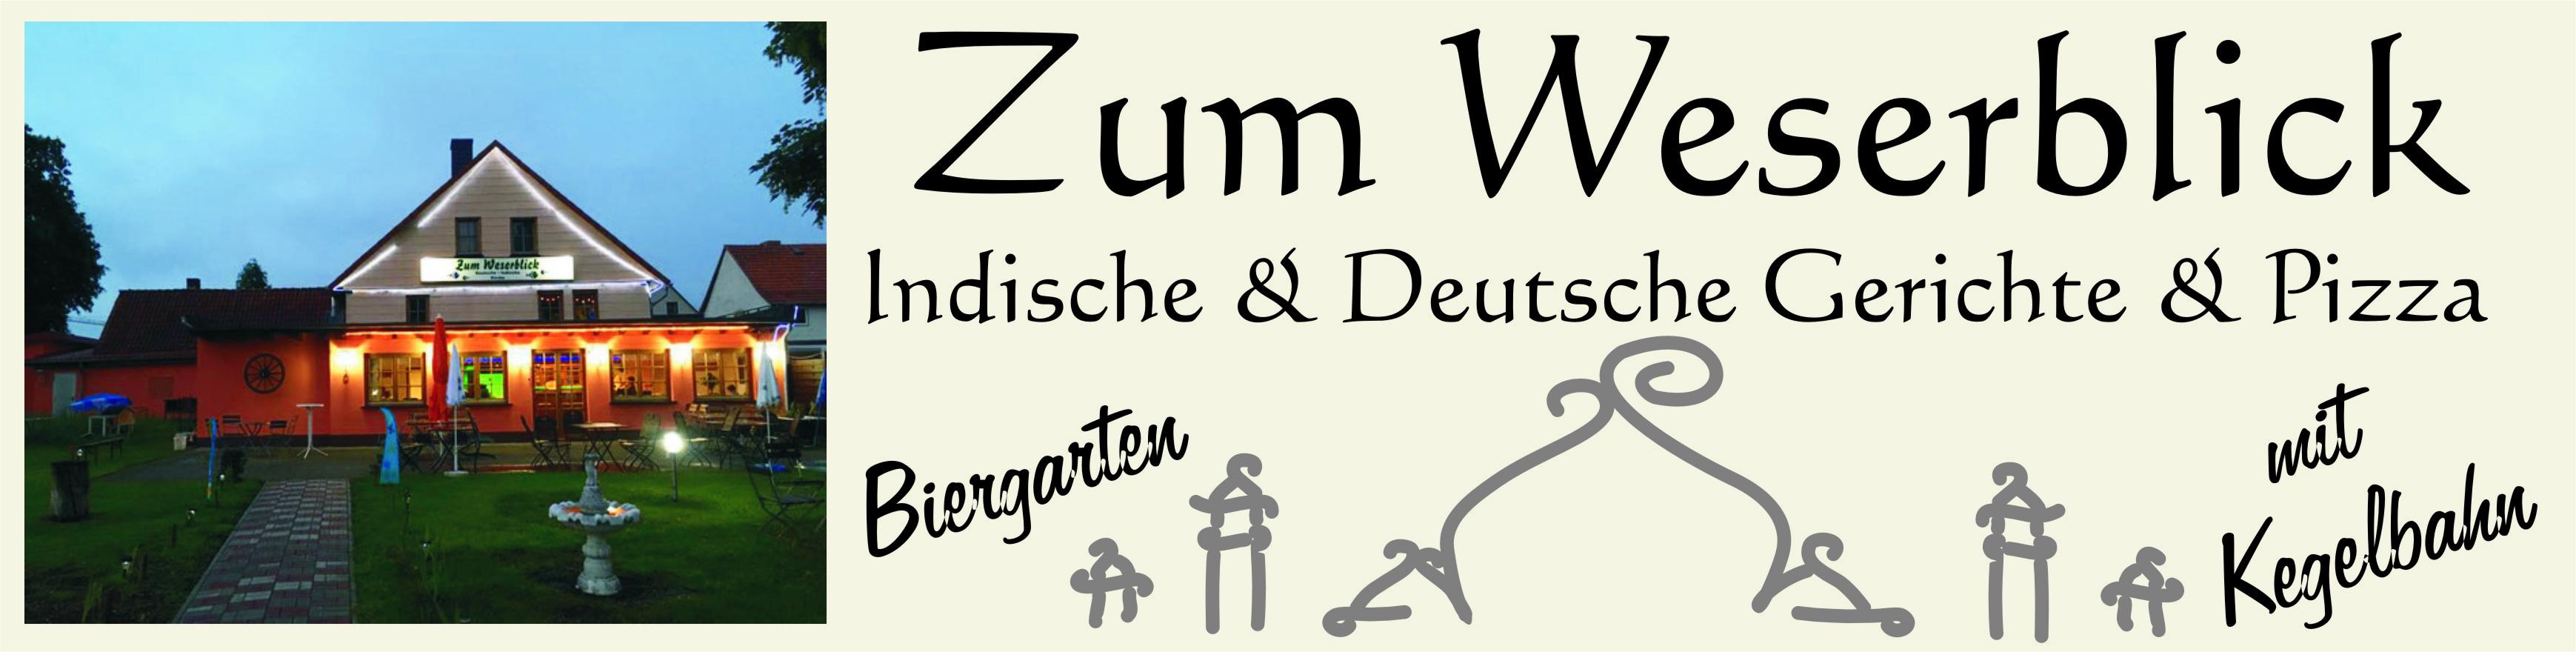 Zum Weserblick